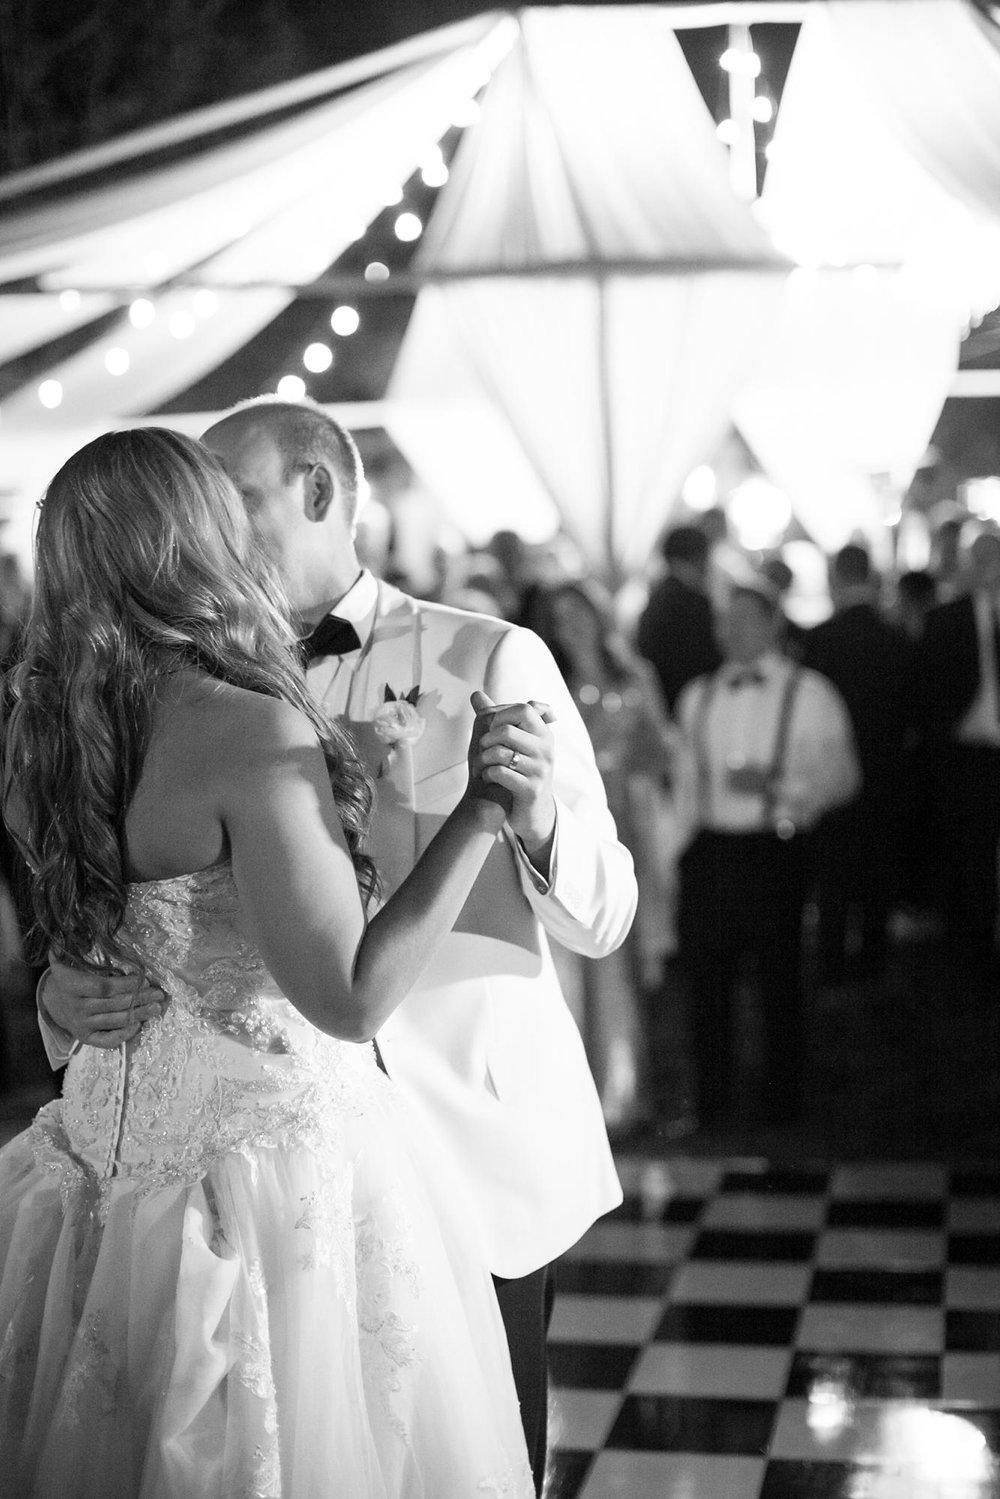 Coto de Caza Wedding | Miki & Sonja Photography | mikiandsonja.com